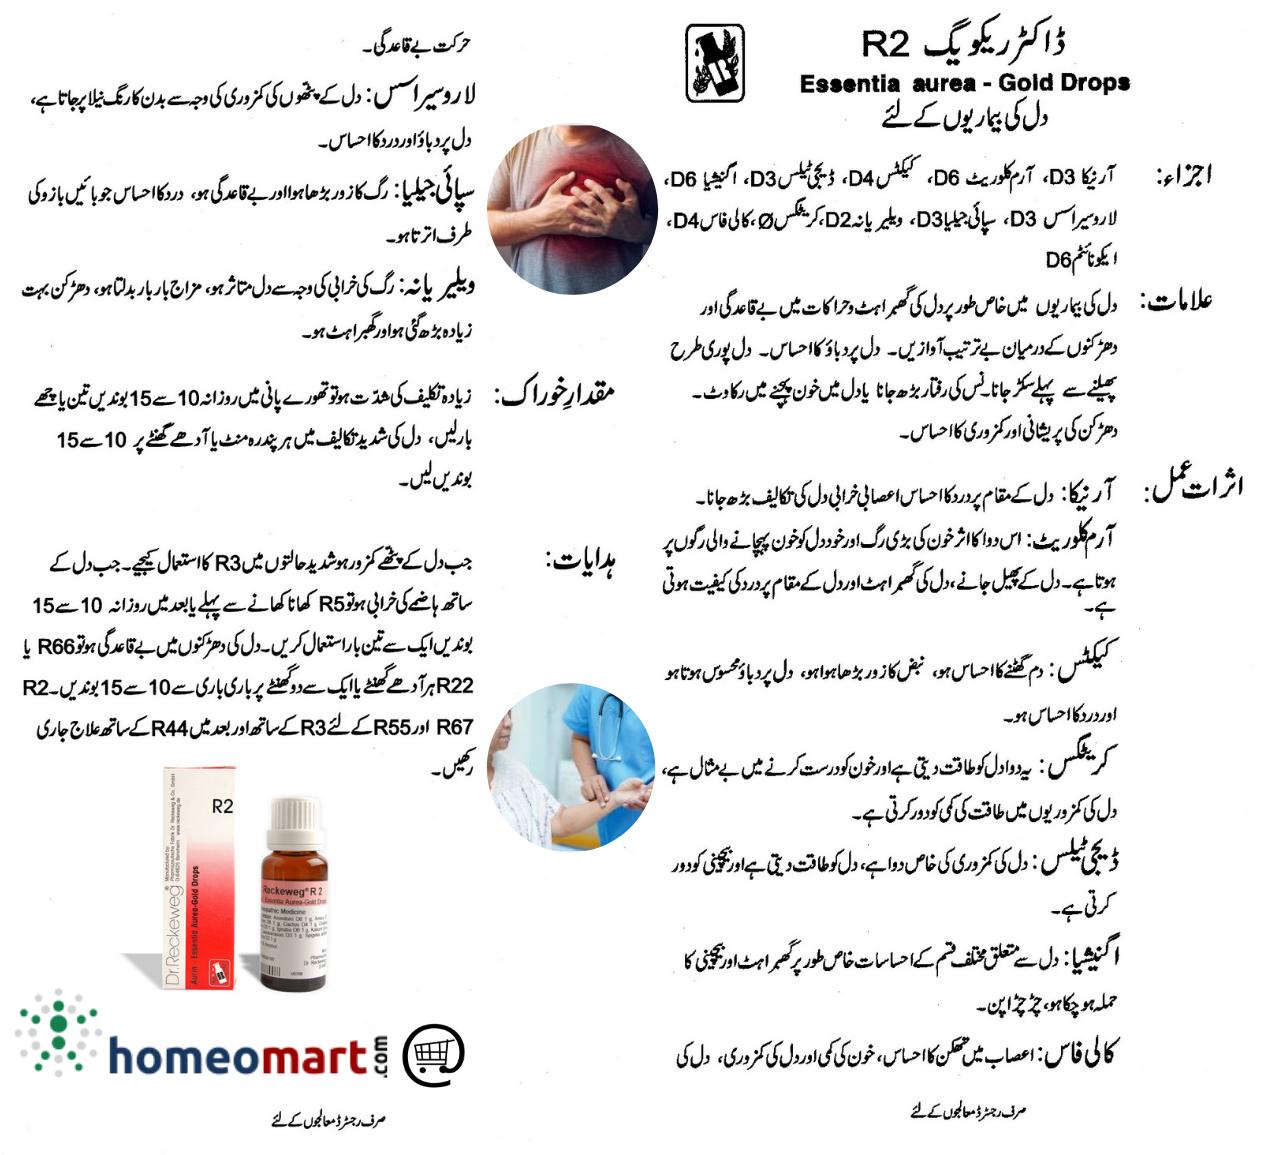 R2 Essentia Aurea Heart Drops In Urdu Homeopathy Homeopathy